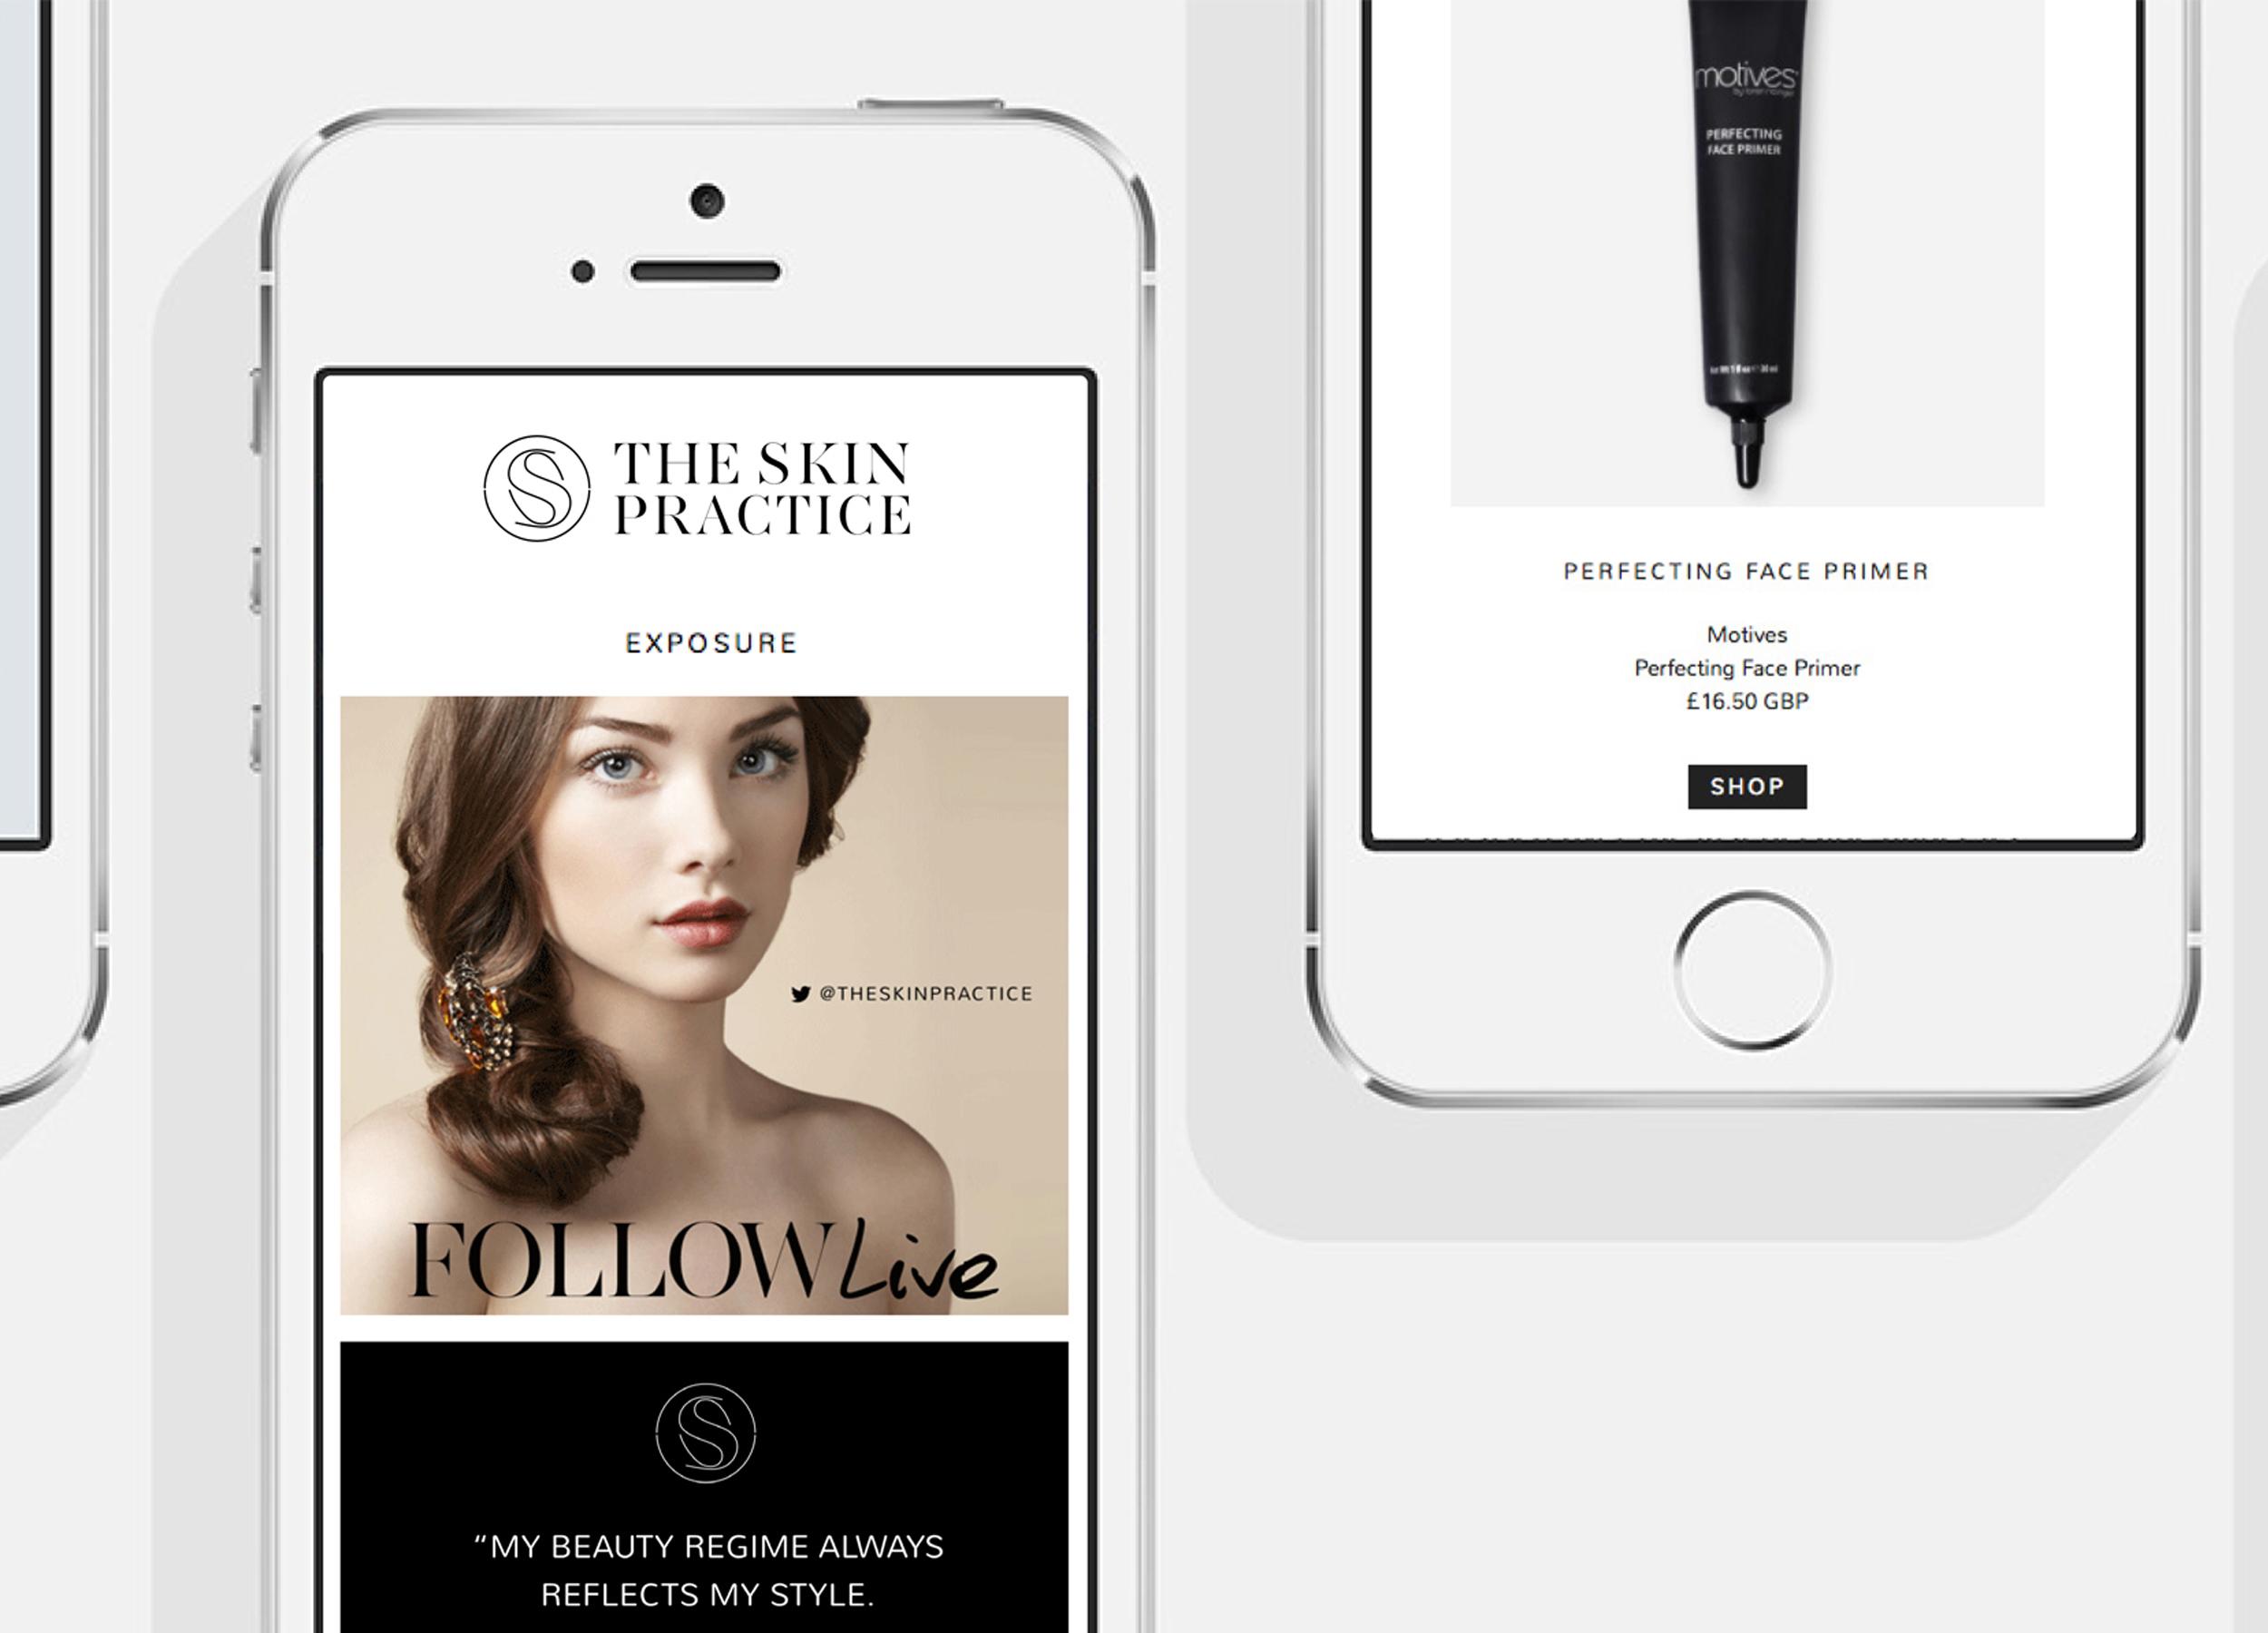 The Skin Practice.com